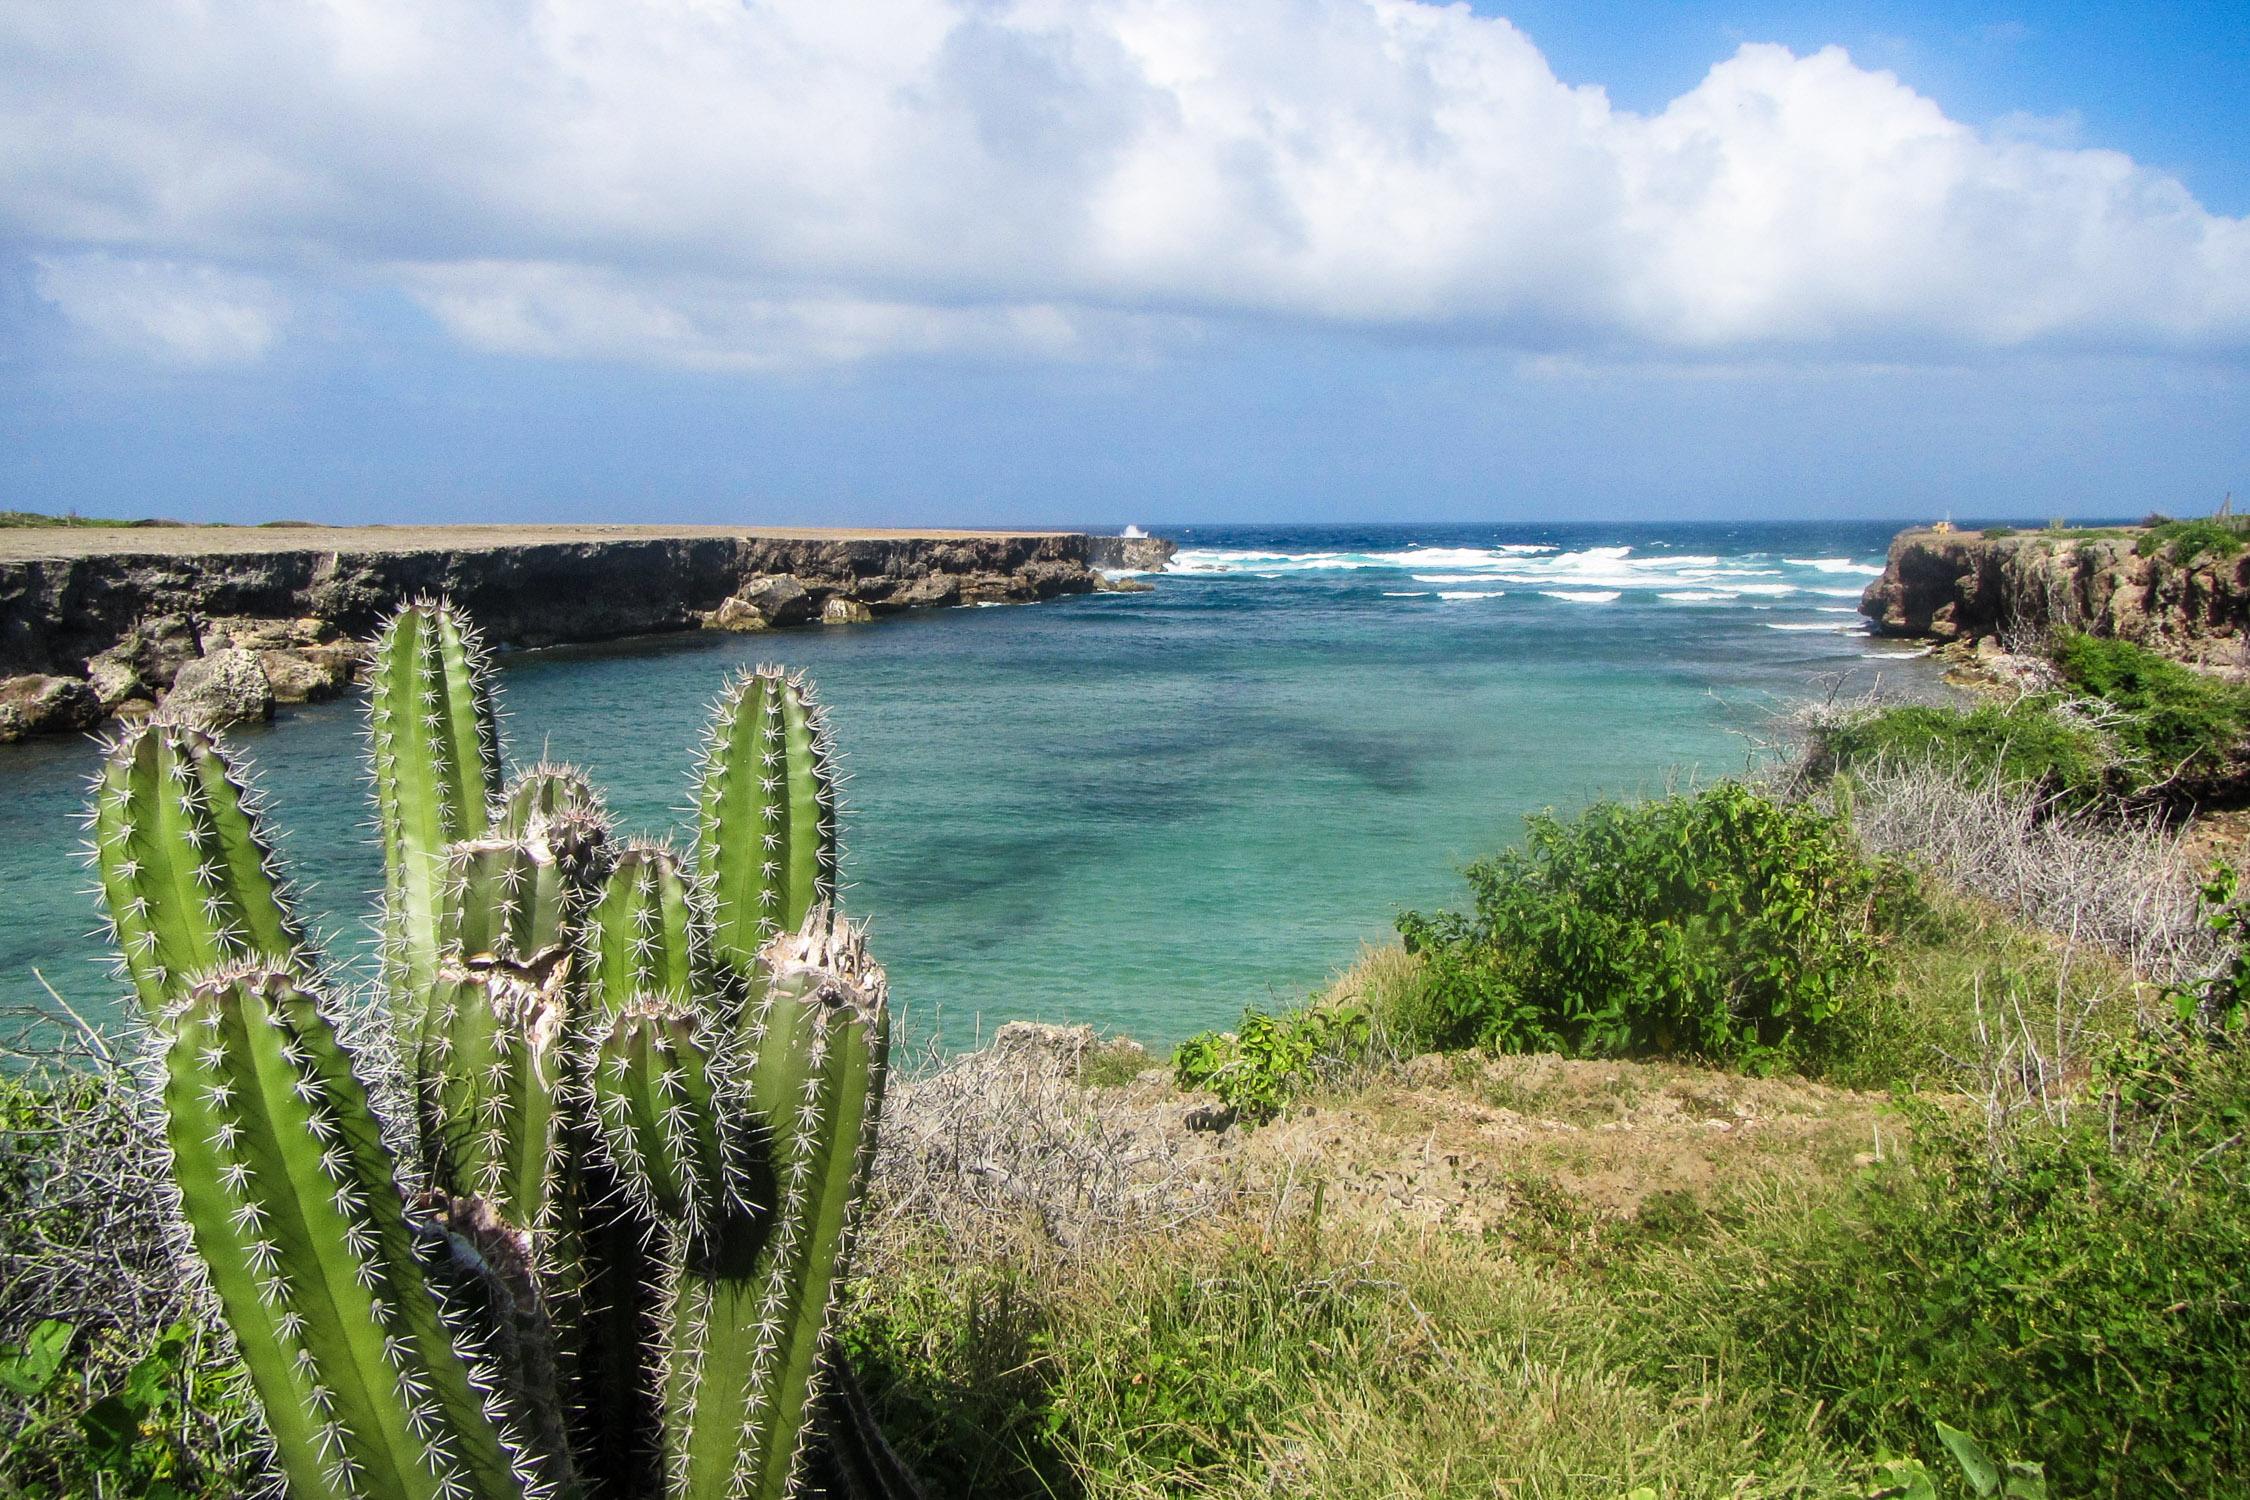 Curacao Tortuga Trail Kaktus